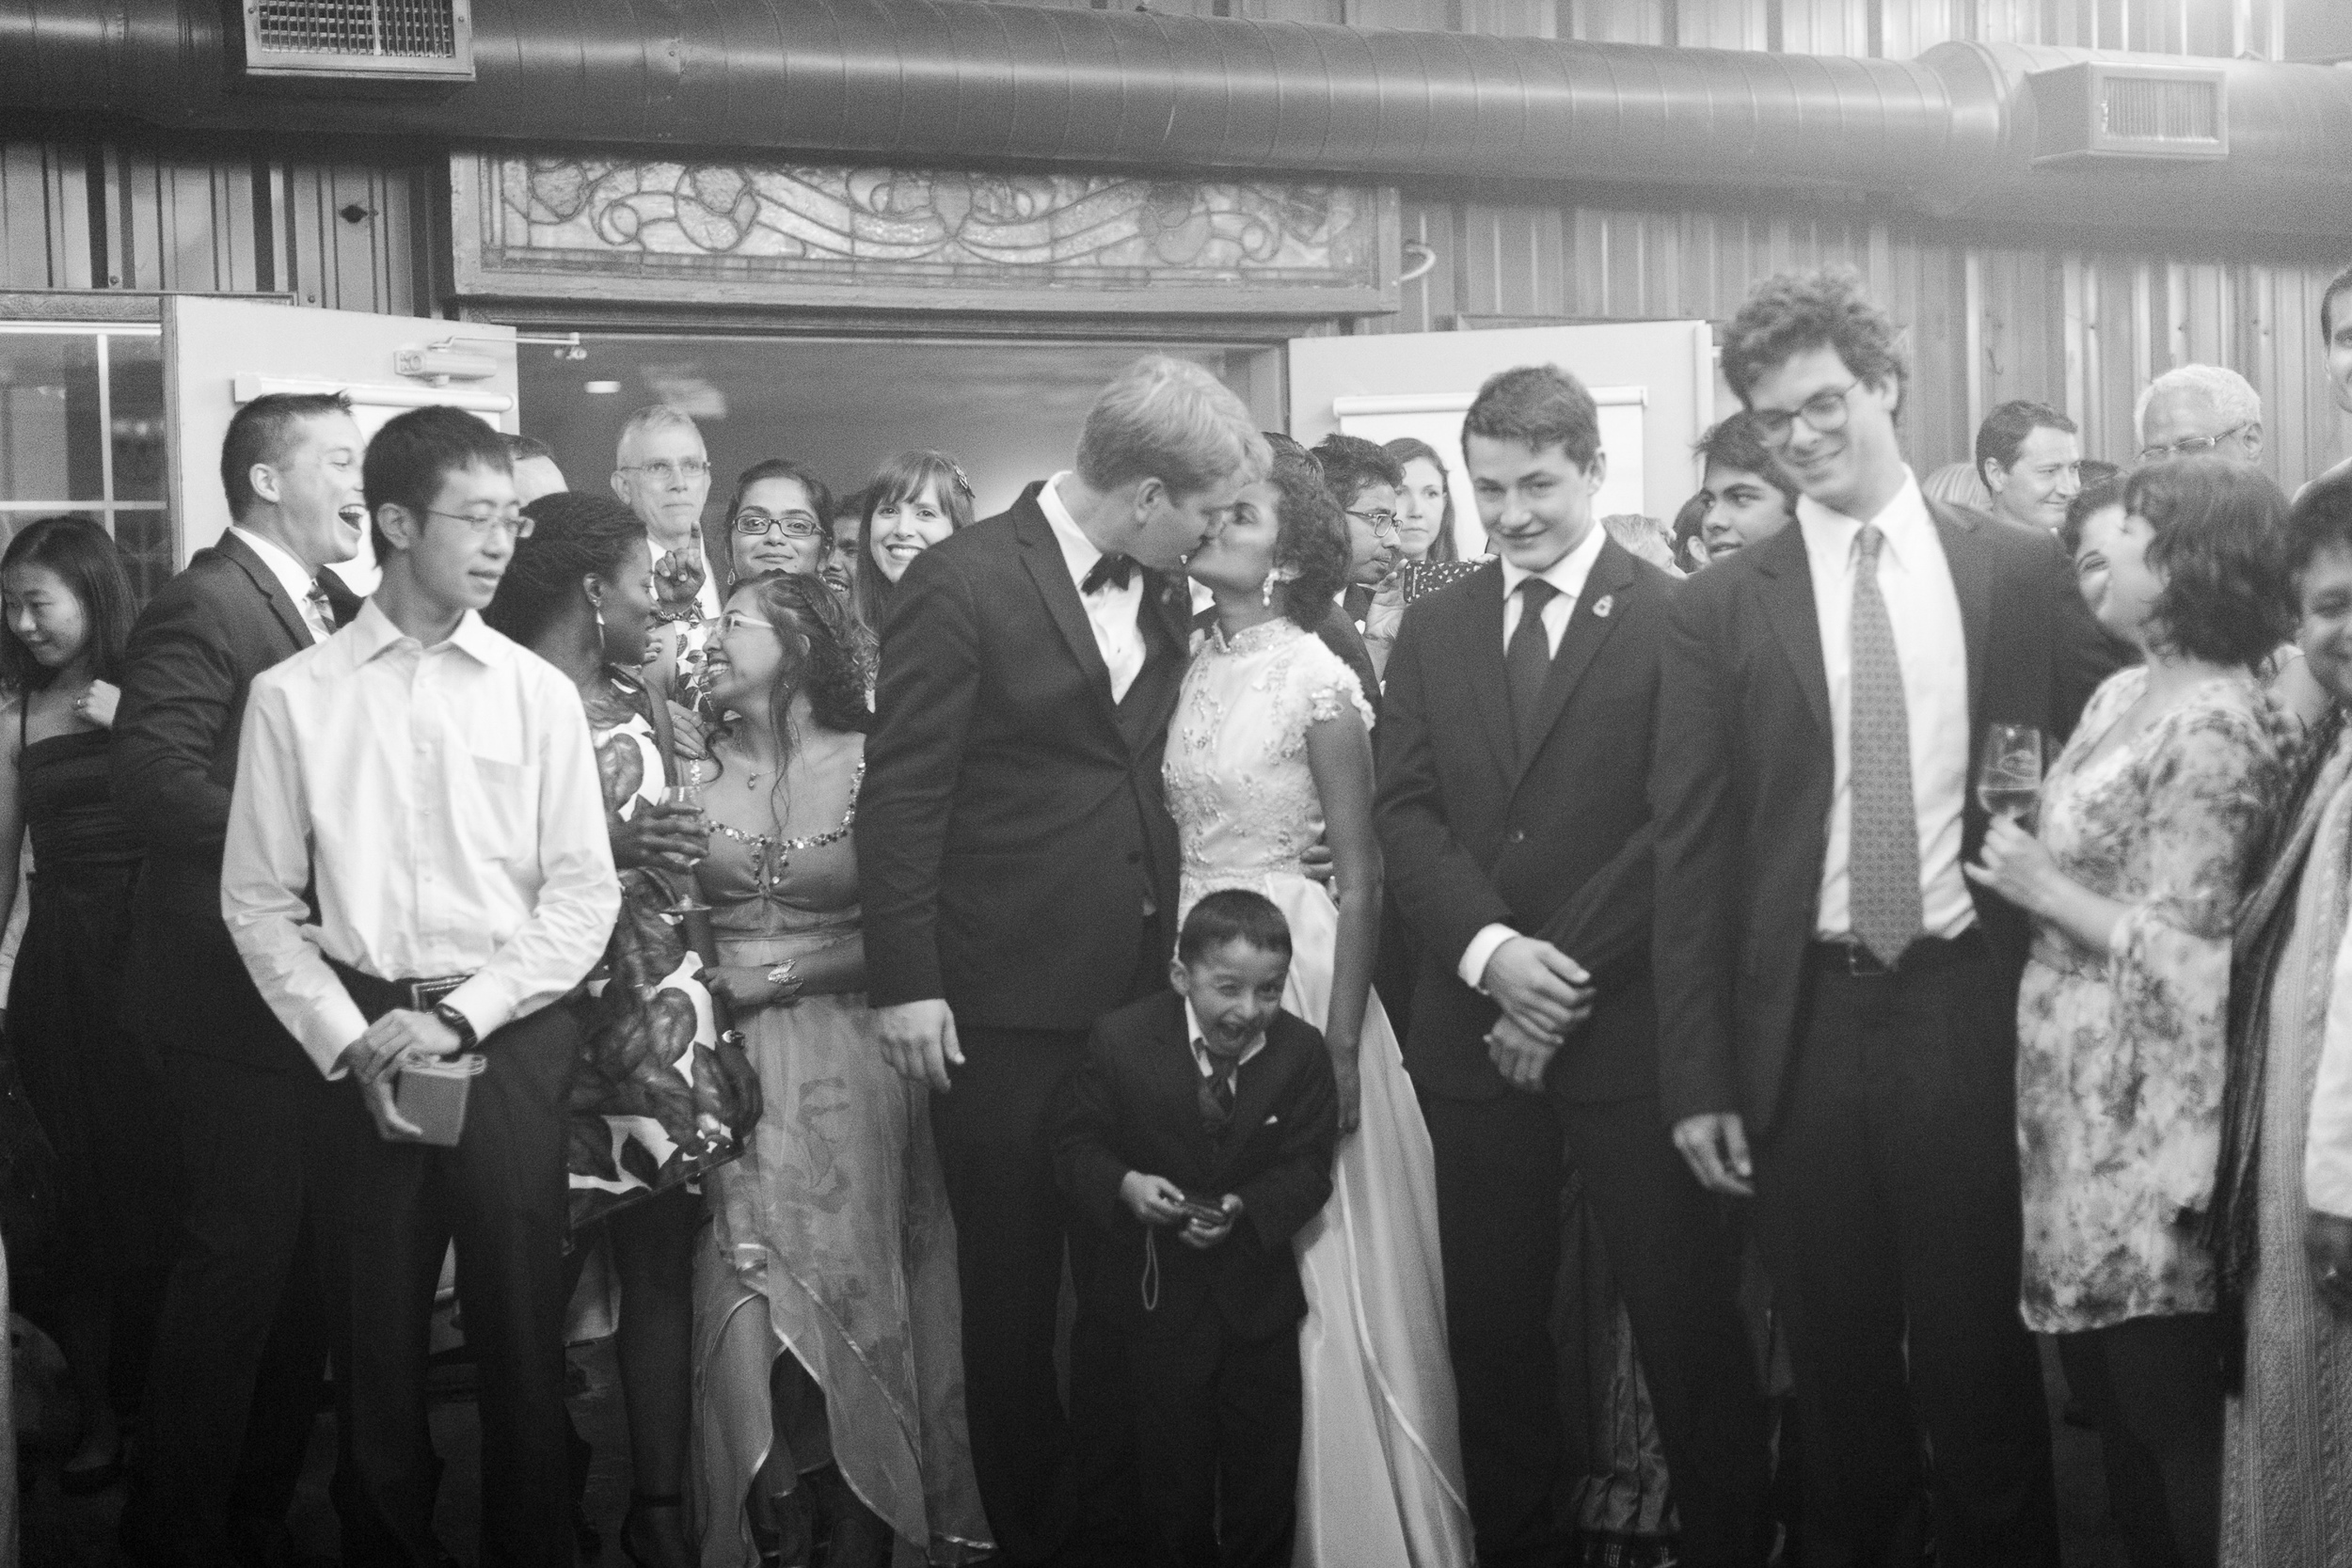 8acd1-messina-hof-wedding-59messina-hof-wedding-59.jpg